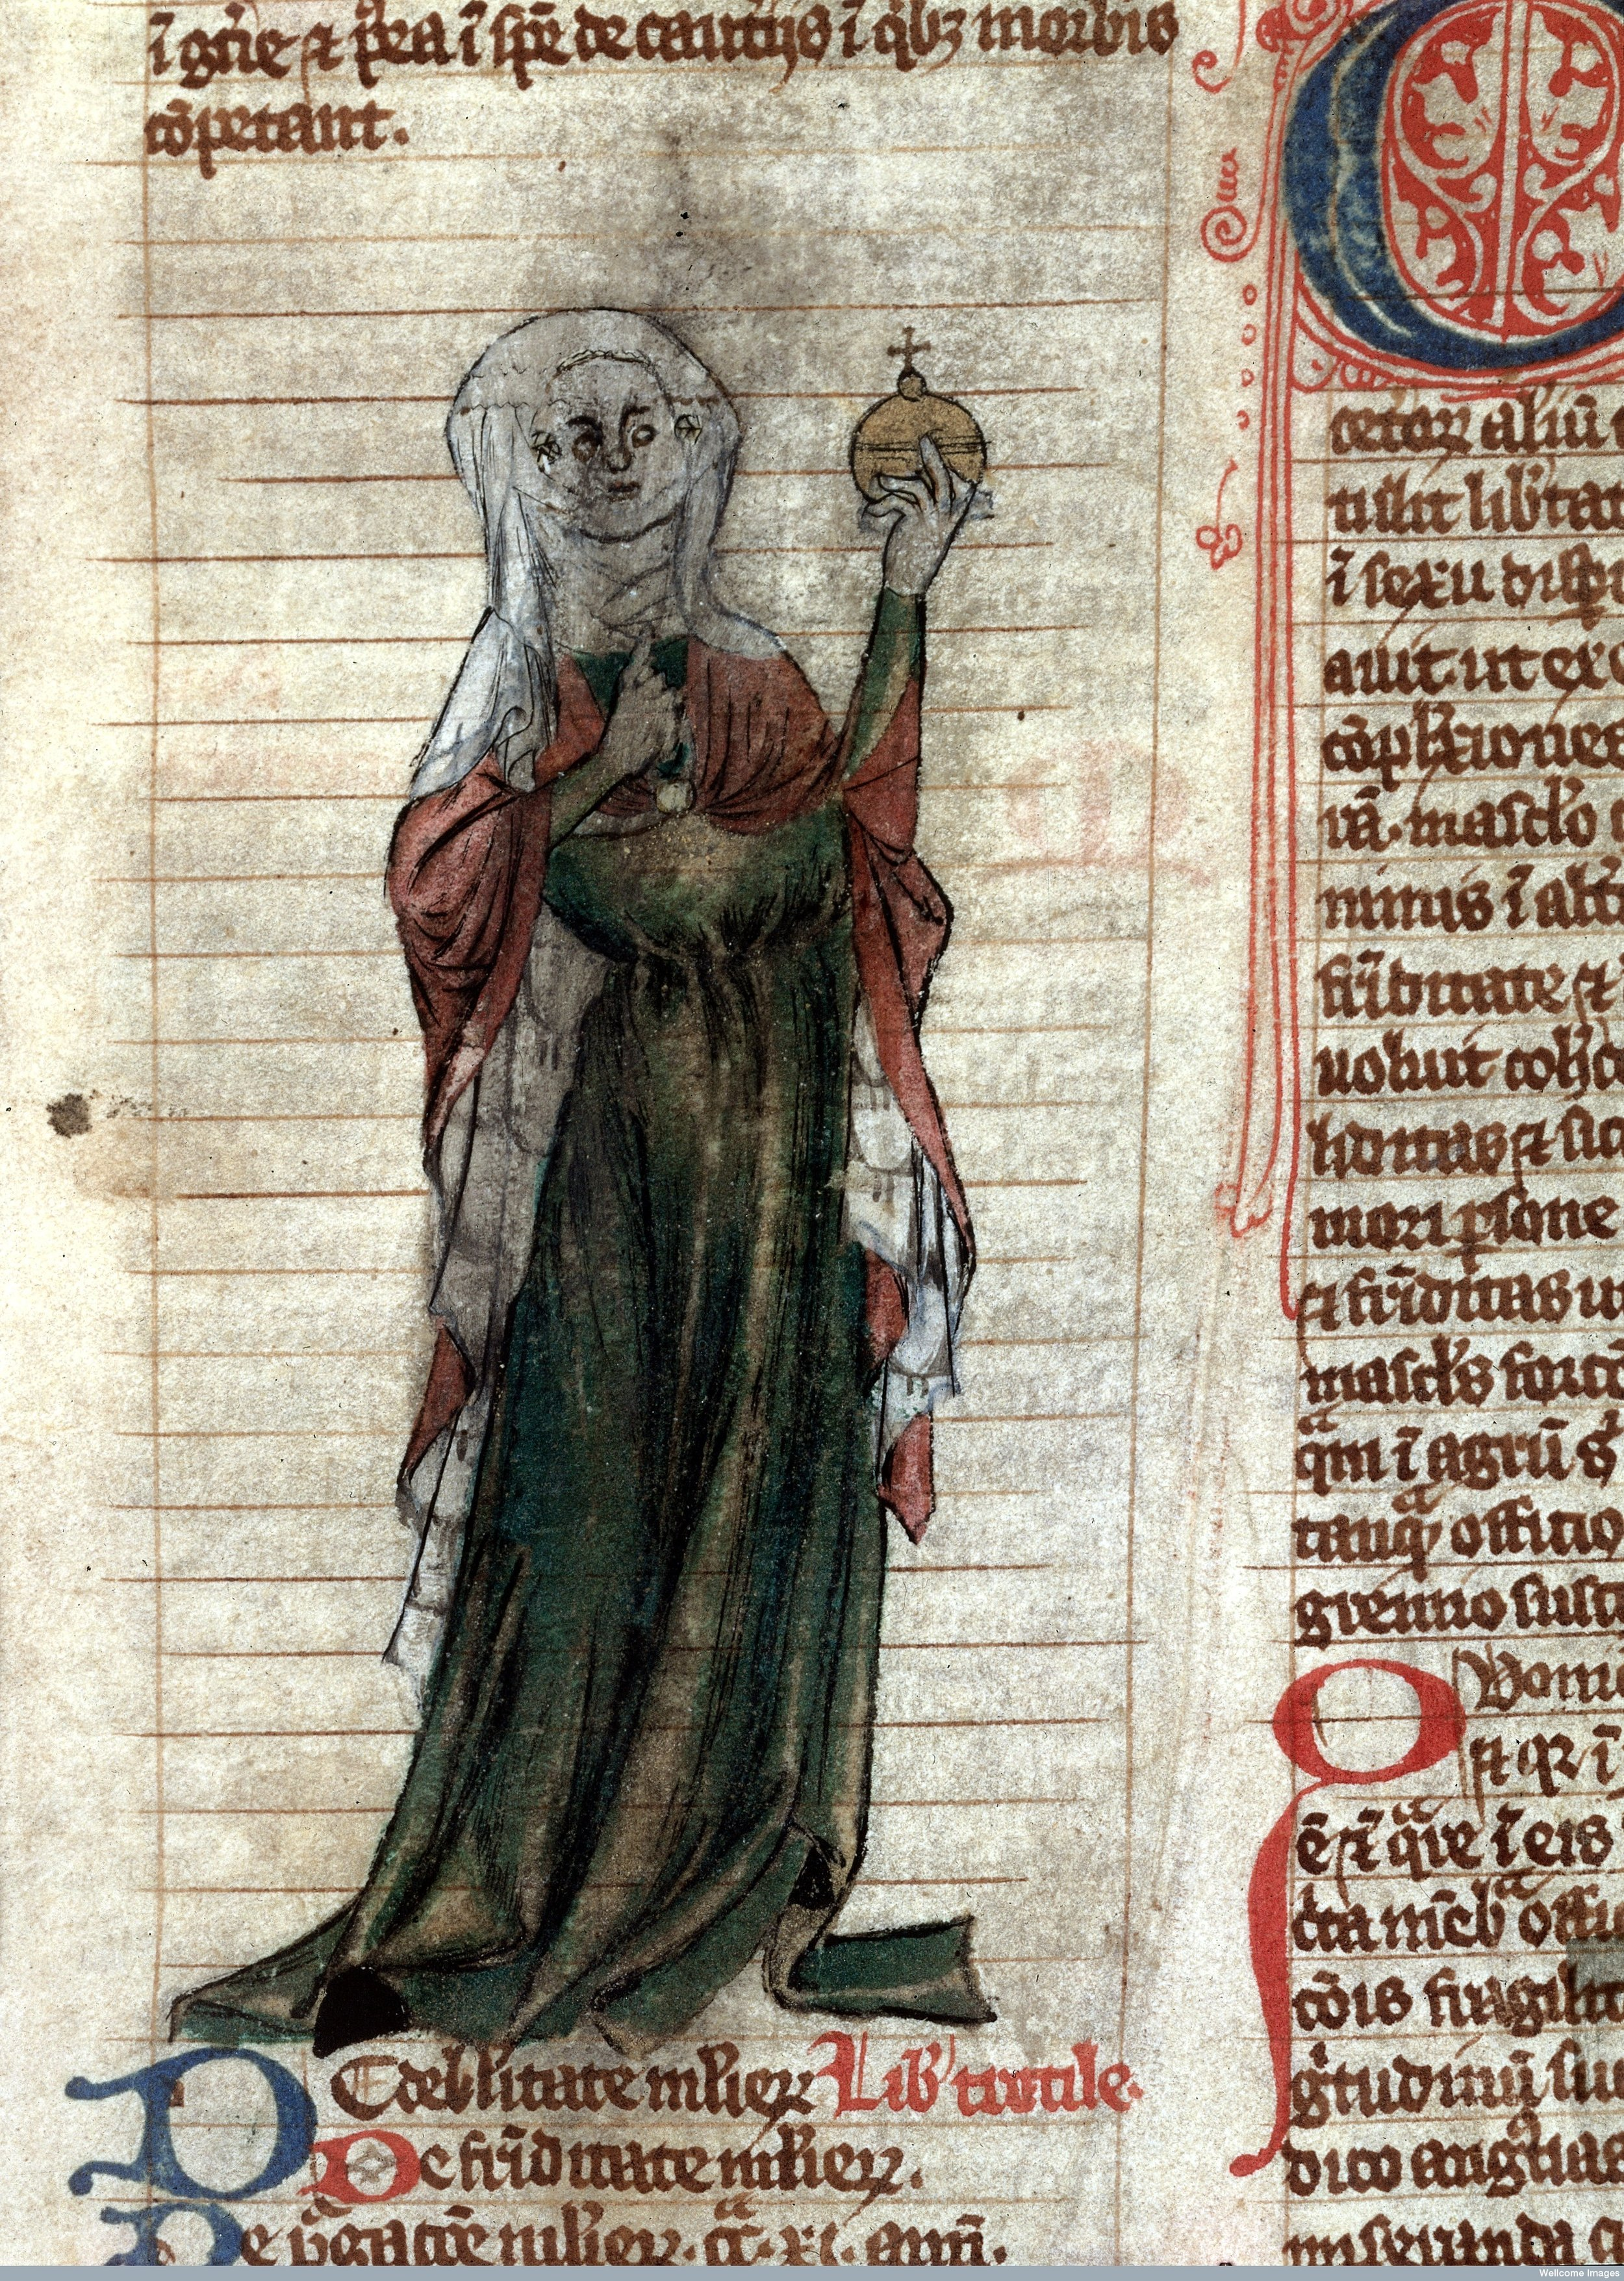 Trotula_of_Salerno_Miscellanea_medica_XVIII_Early_14th_Century.jpg